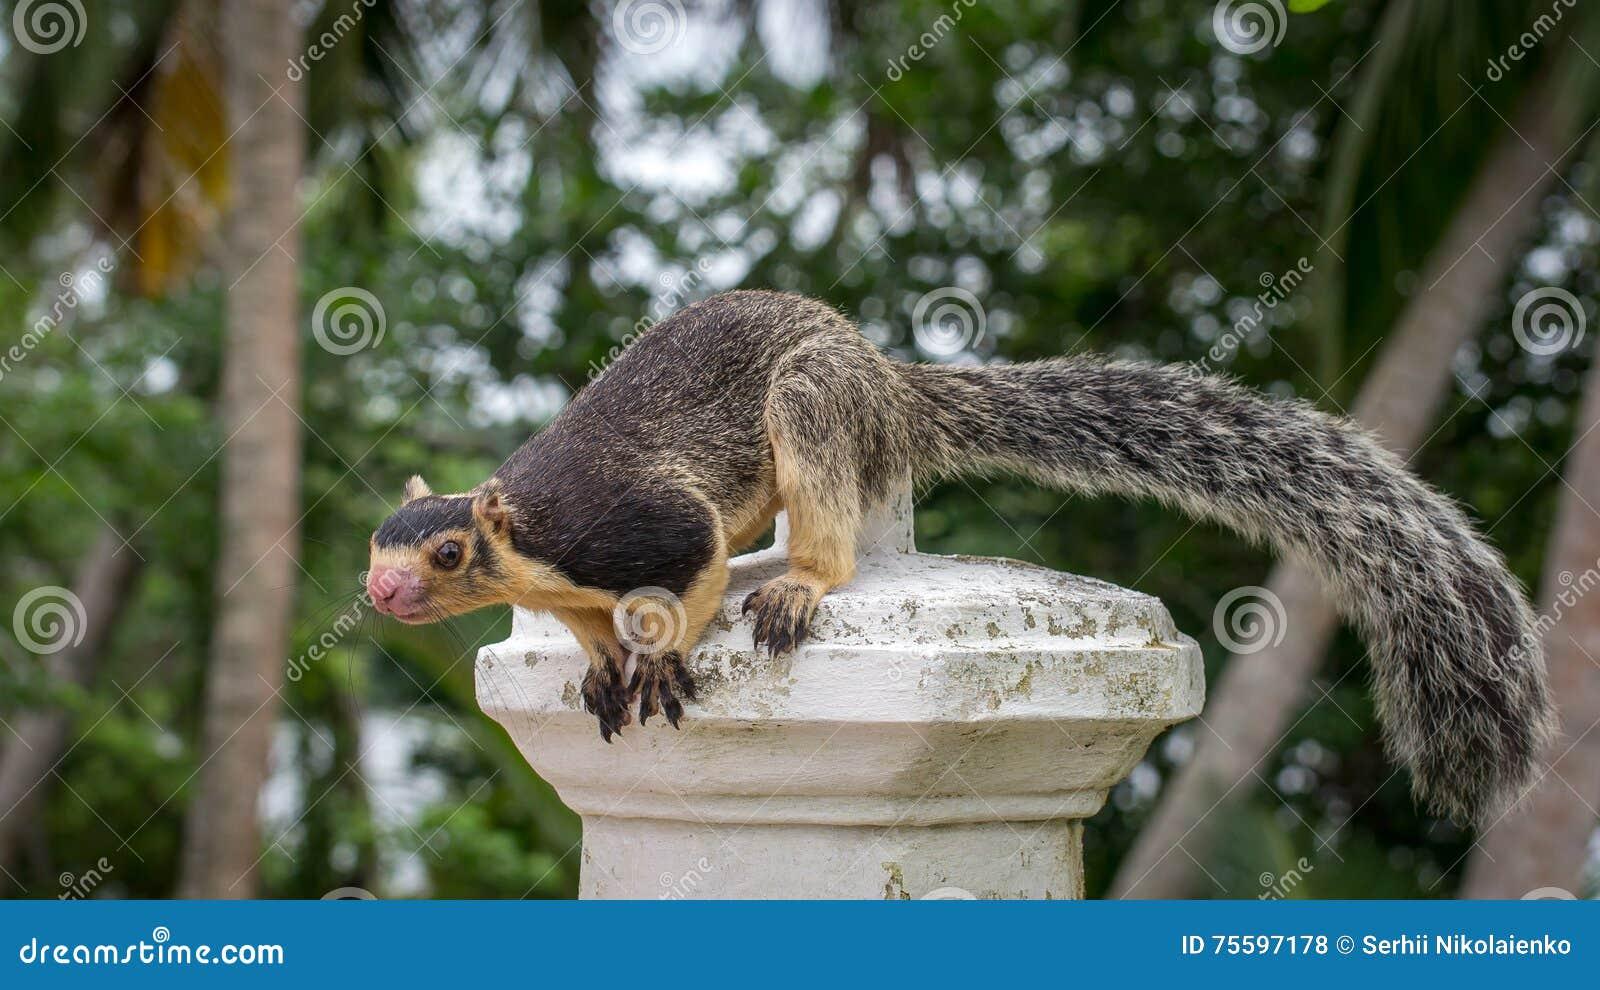 Ratufa  Giant Ceylon Squirrel  Stock Photo - Image of lanka